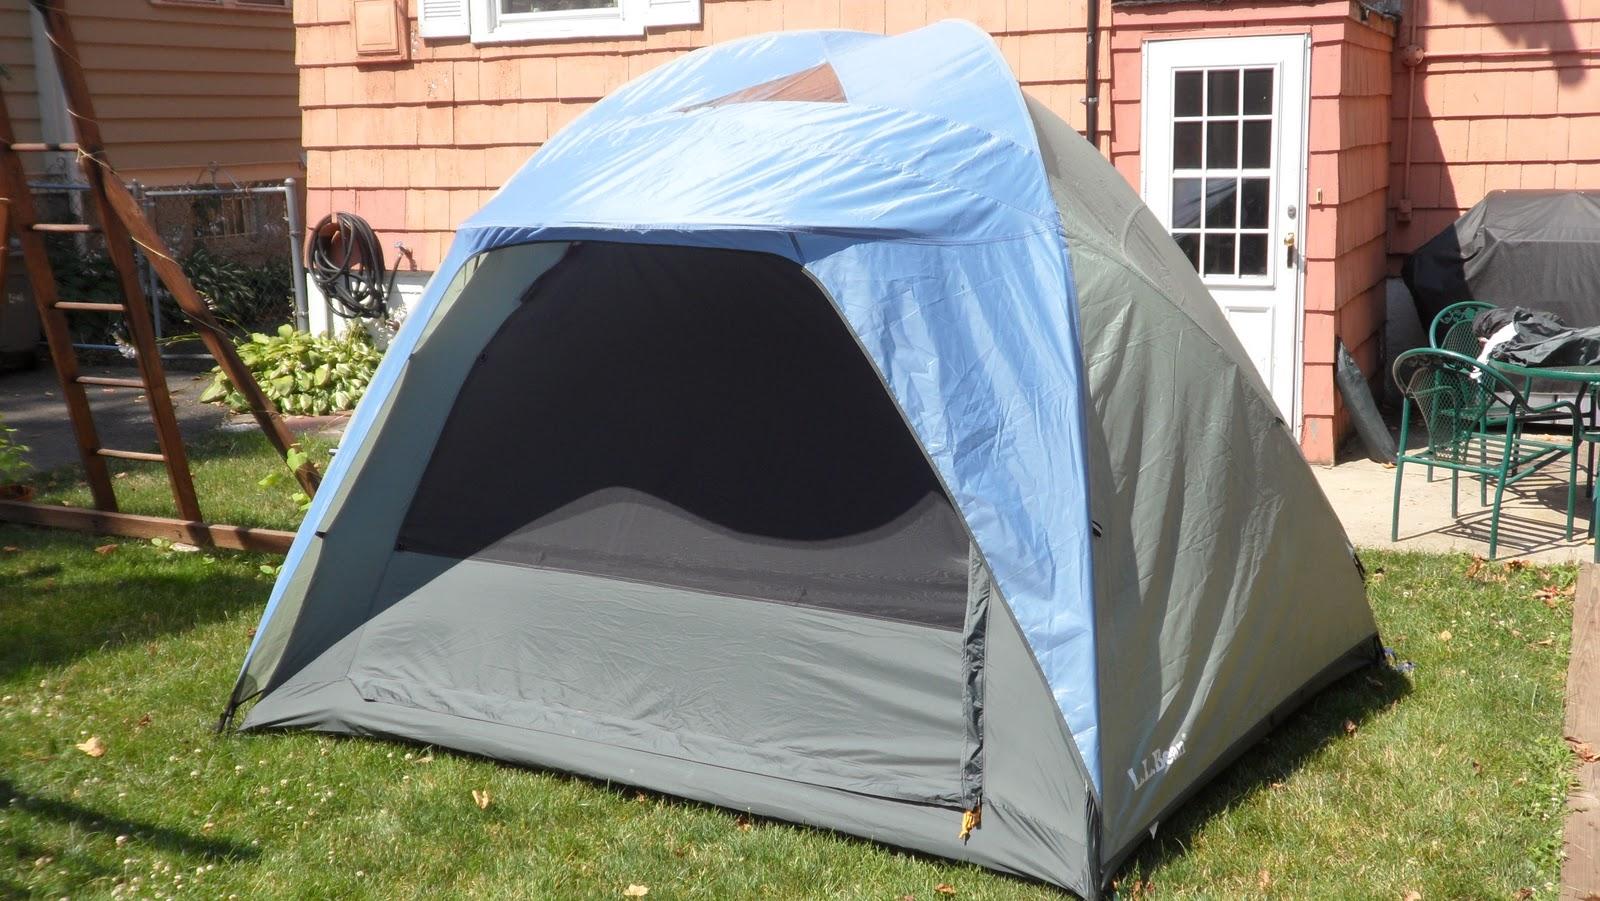 L L Bean Dome Tent 6 For Sale L L Bean Dome Tent 6 For Sale